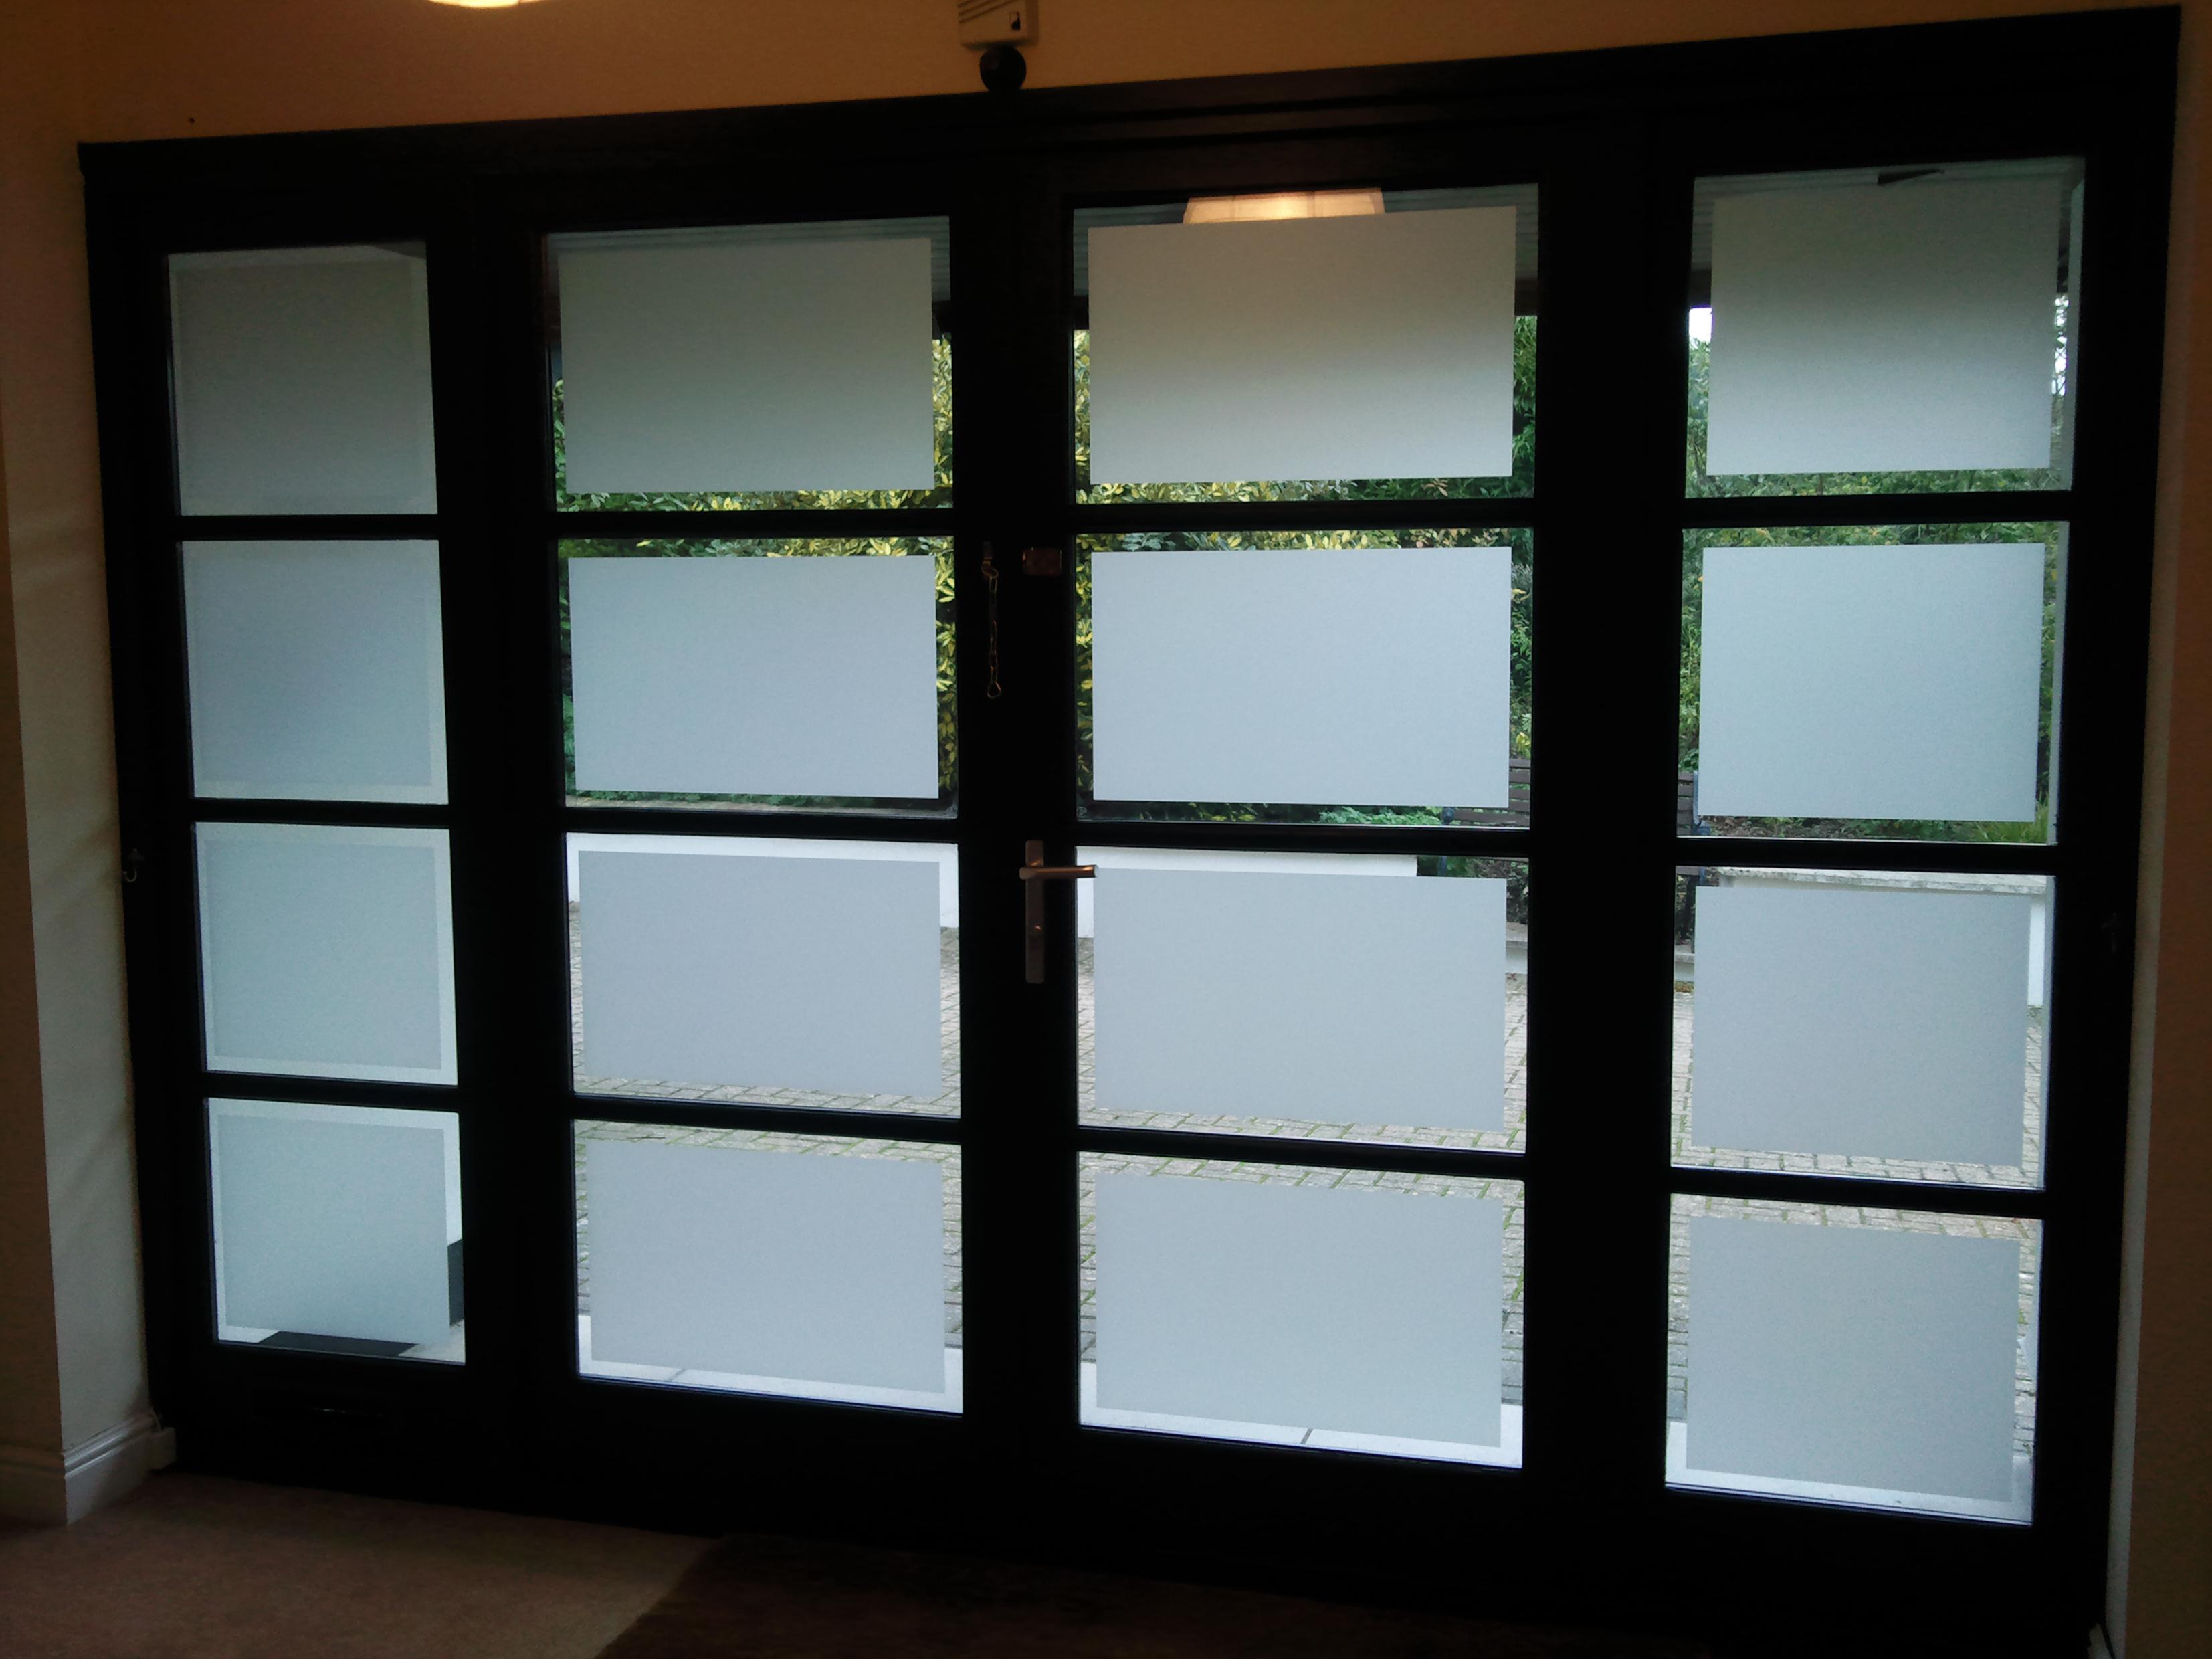 Residential Frosted Window Film In Tiverton Devon